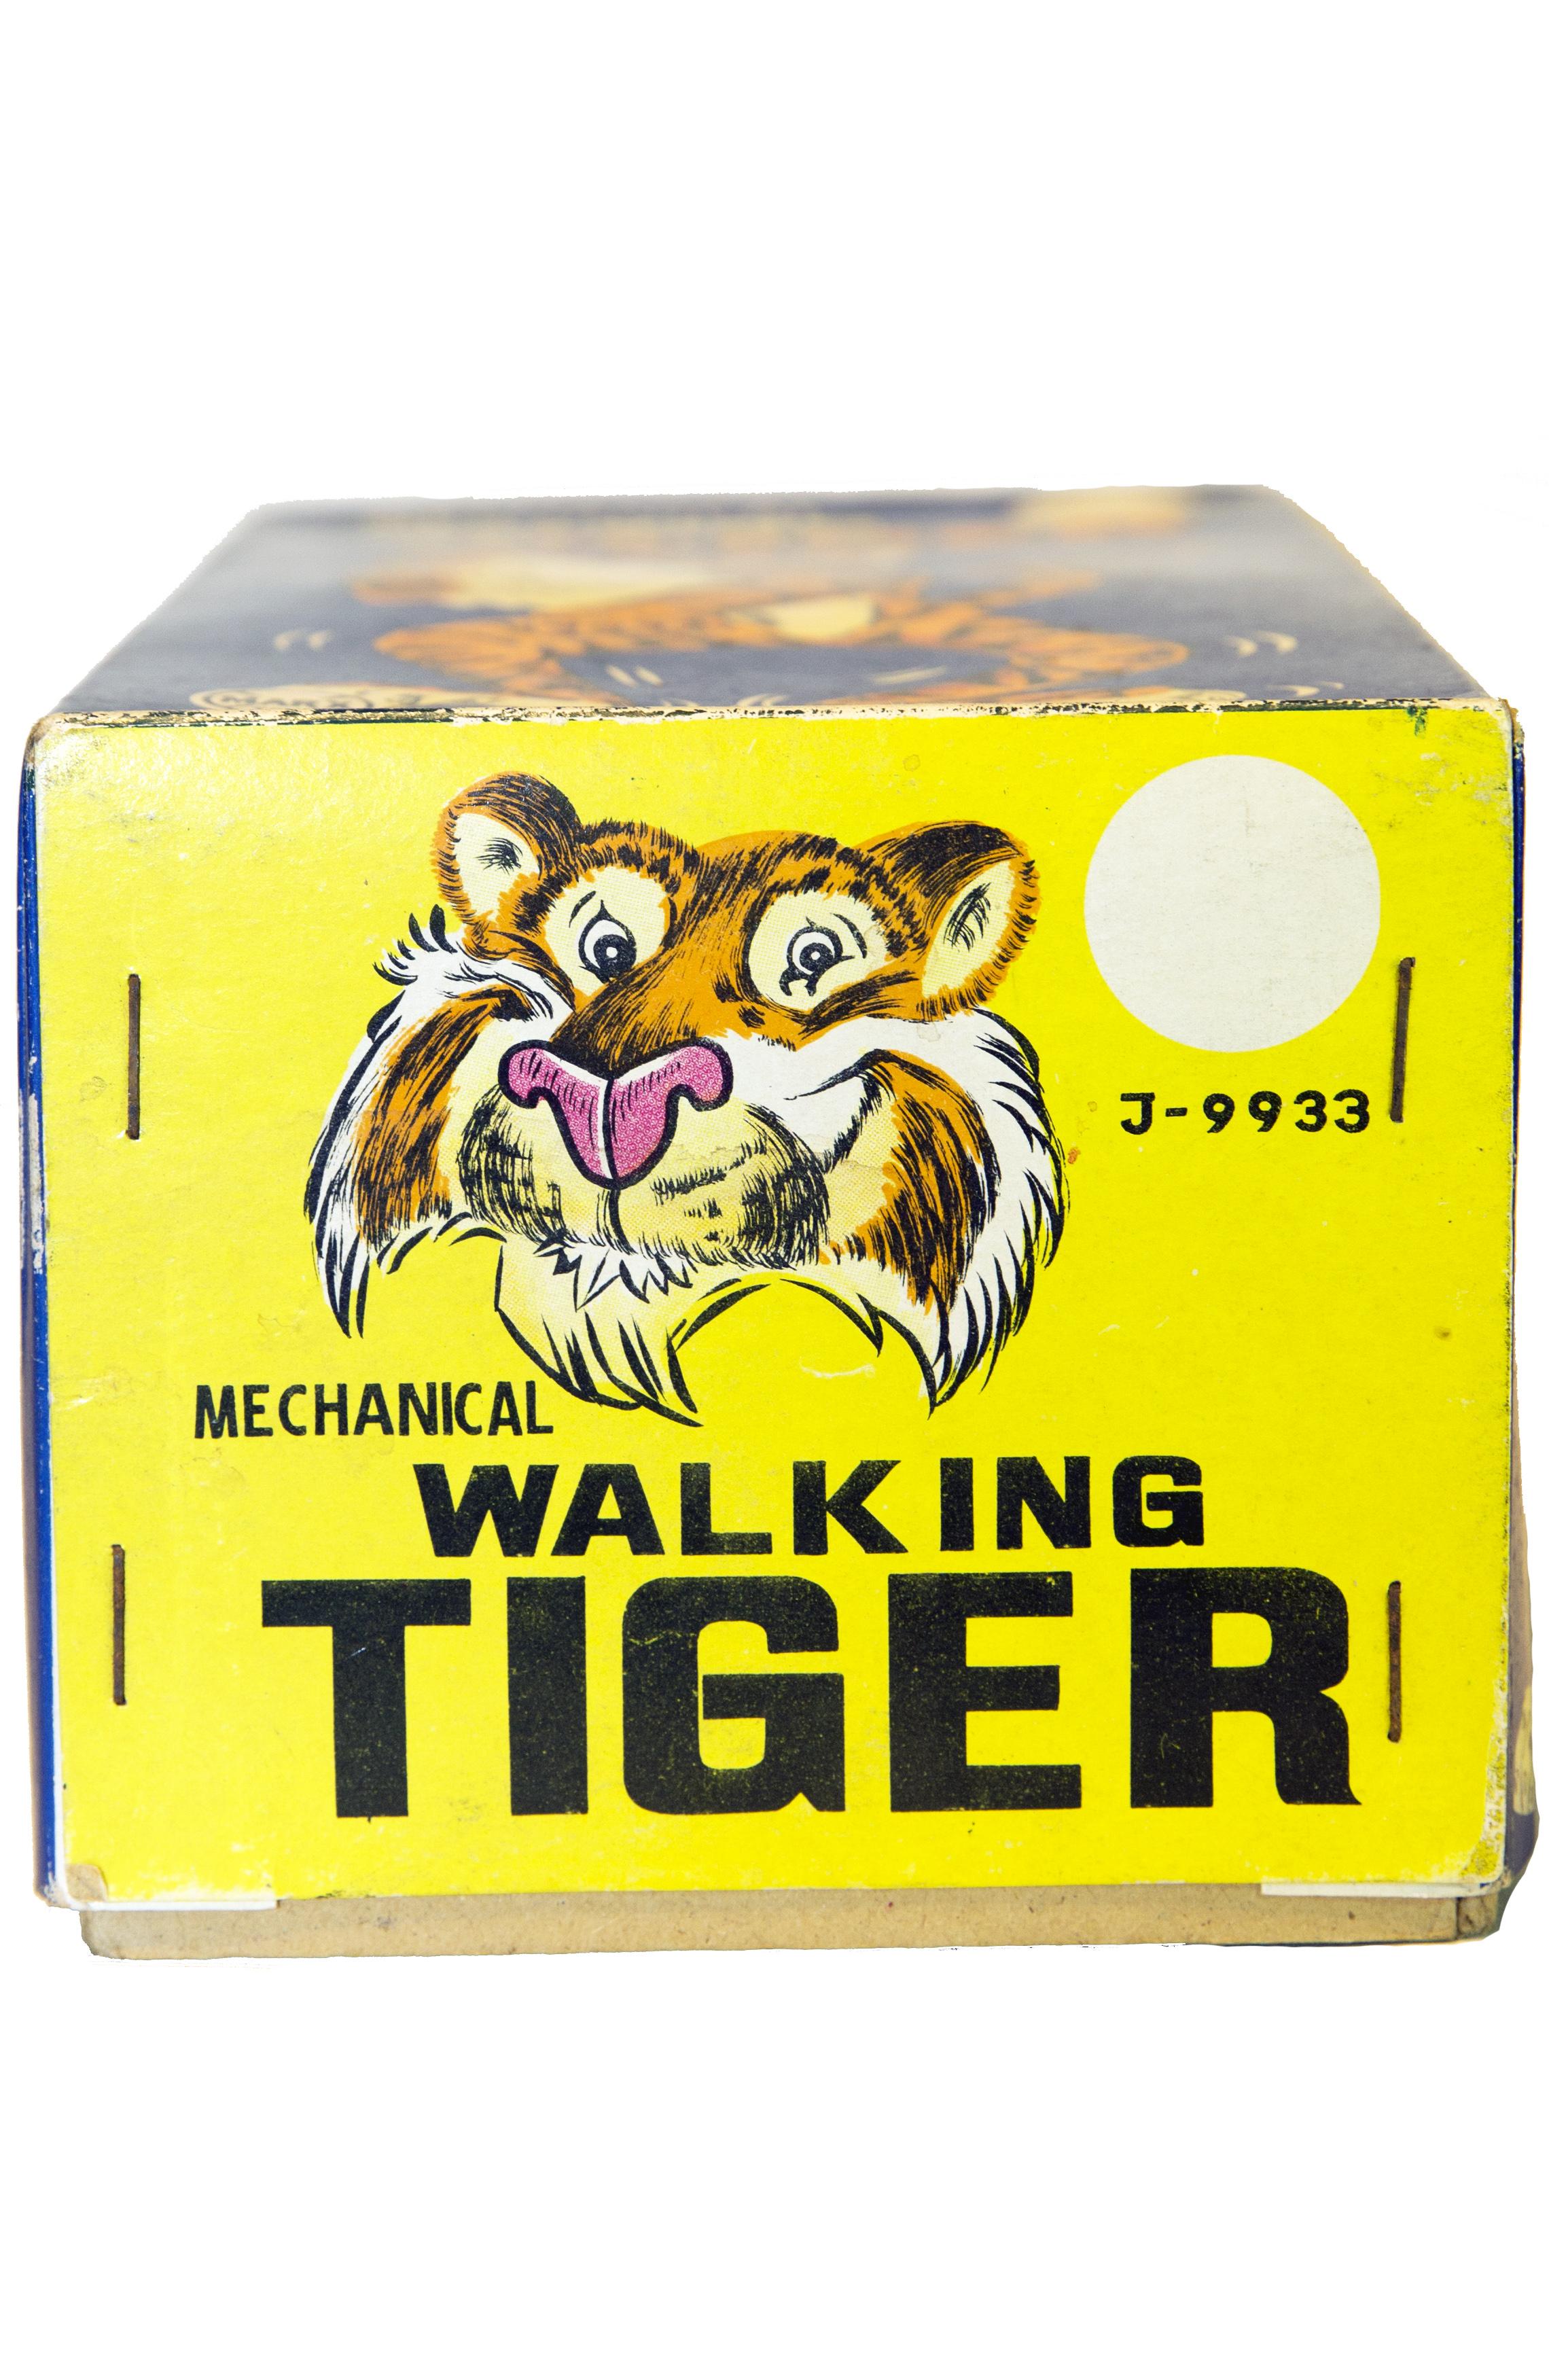 MECHANICAL WALKING TIGER WIND-UP